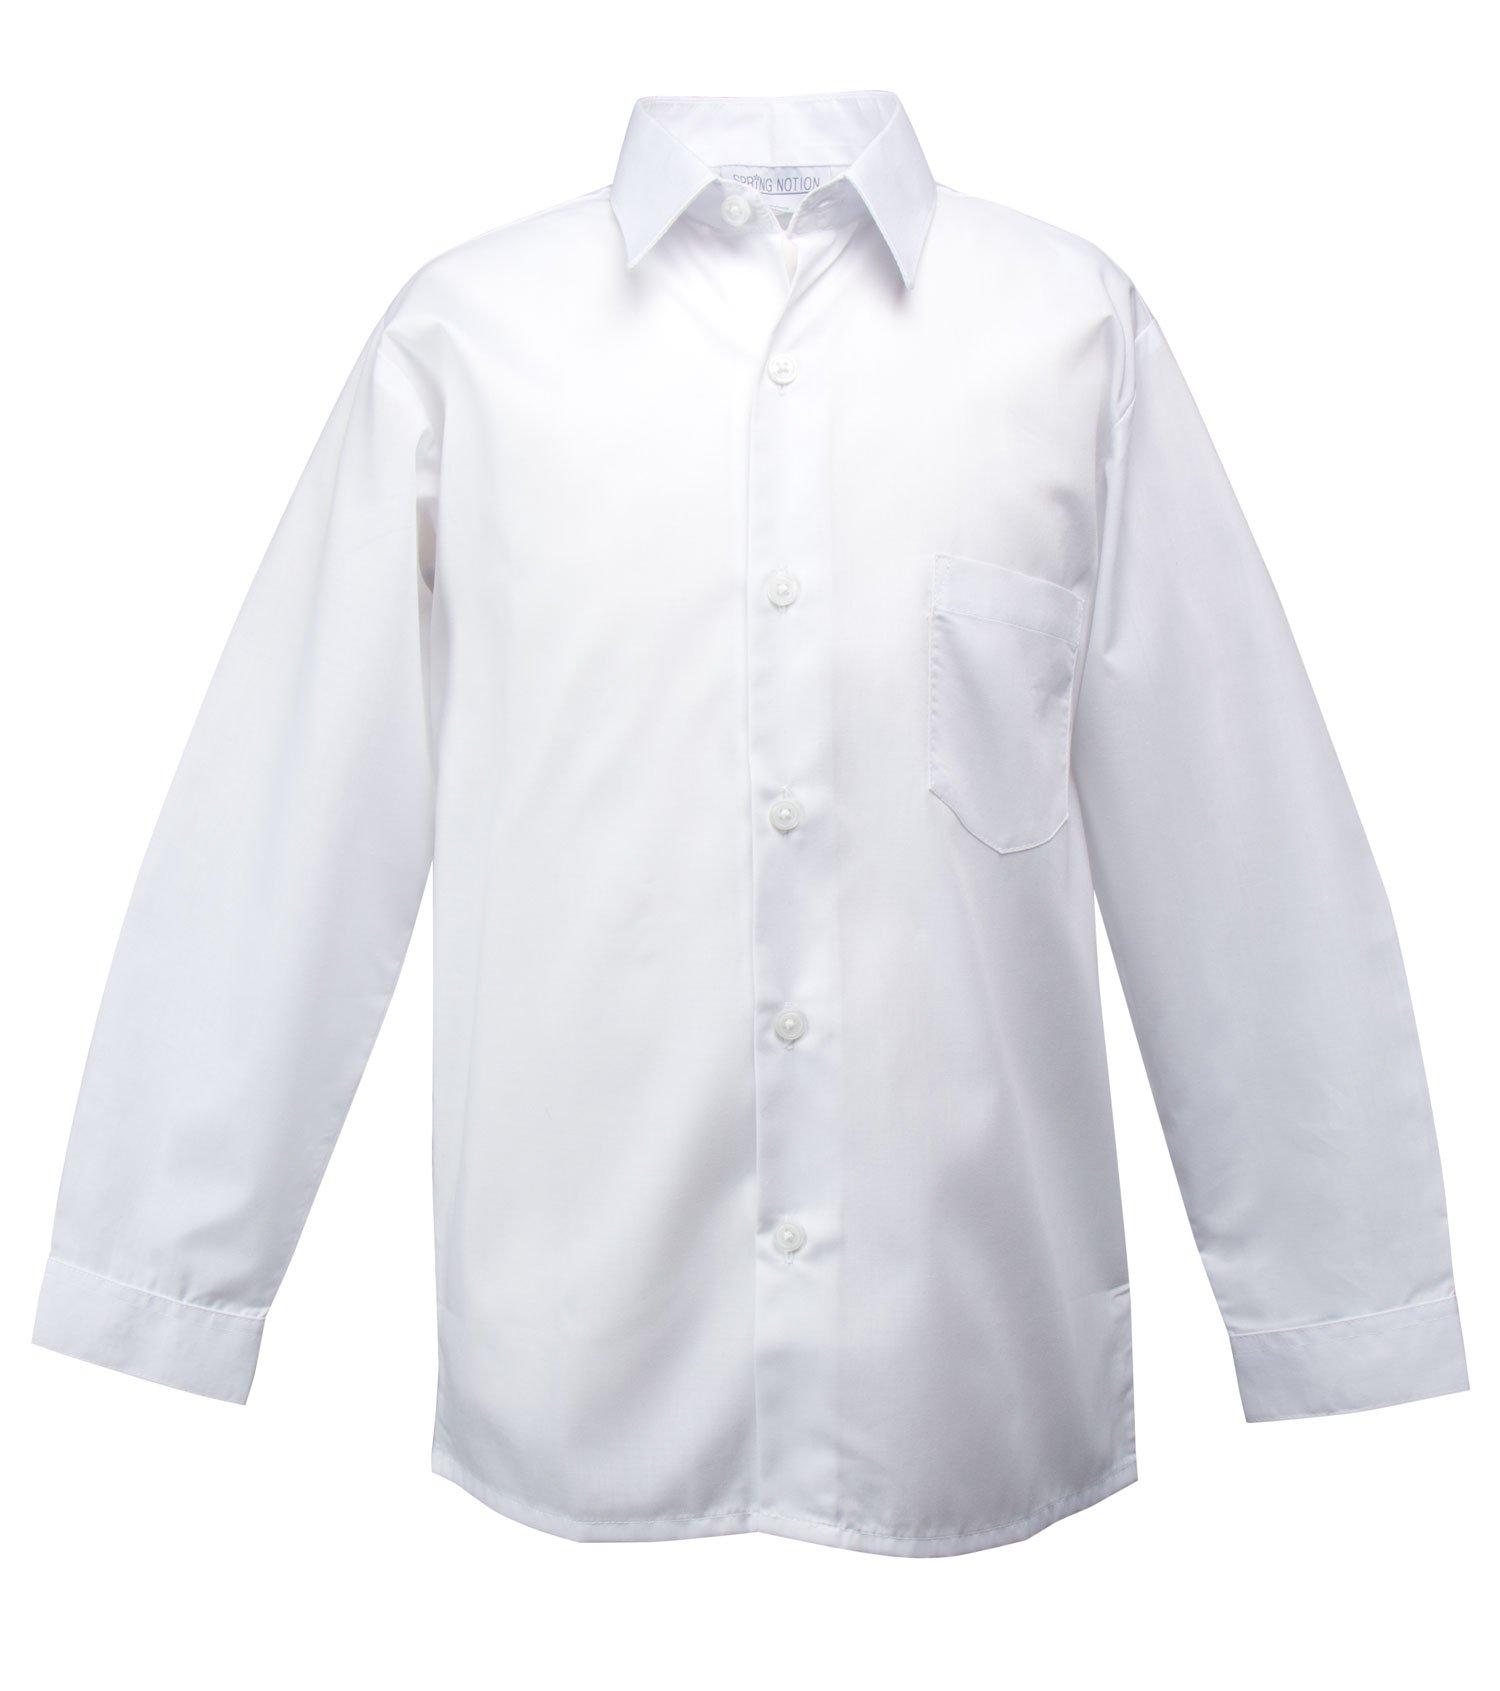 Spring Notion Big Boys' Long Sleeve Dress Shirt 14 White